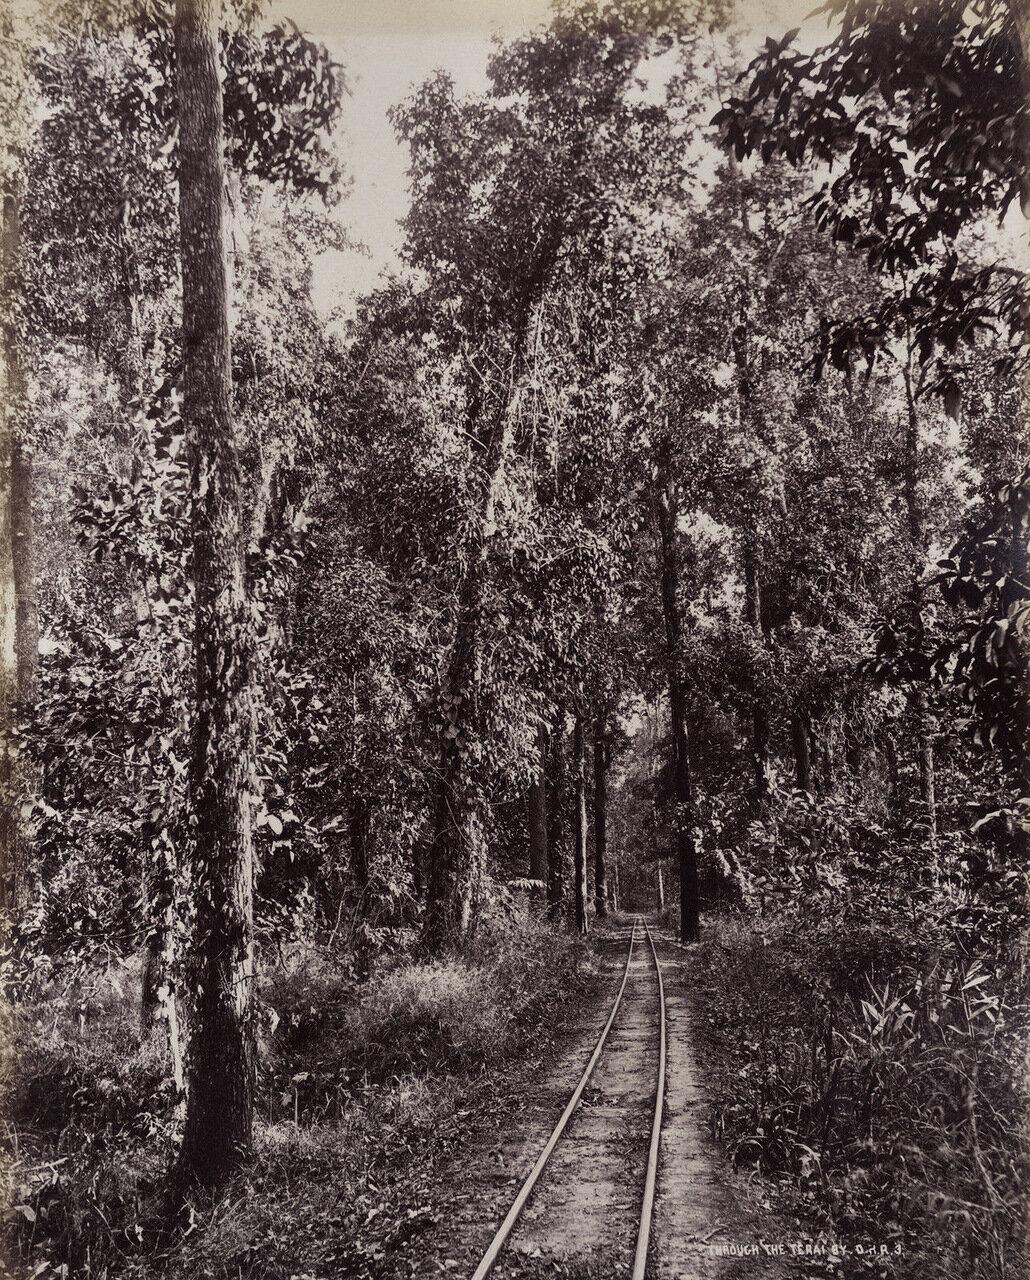 Дарджилинг-Гималайская железная дорога. 1880